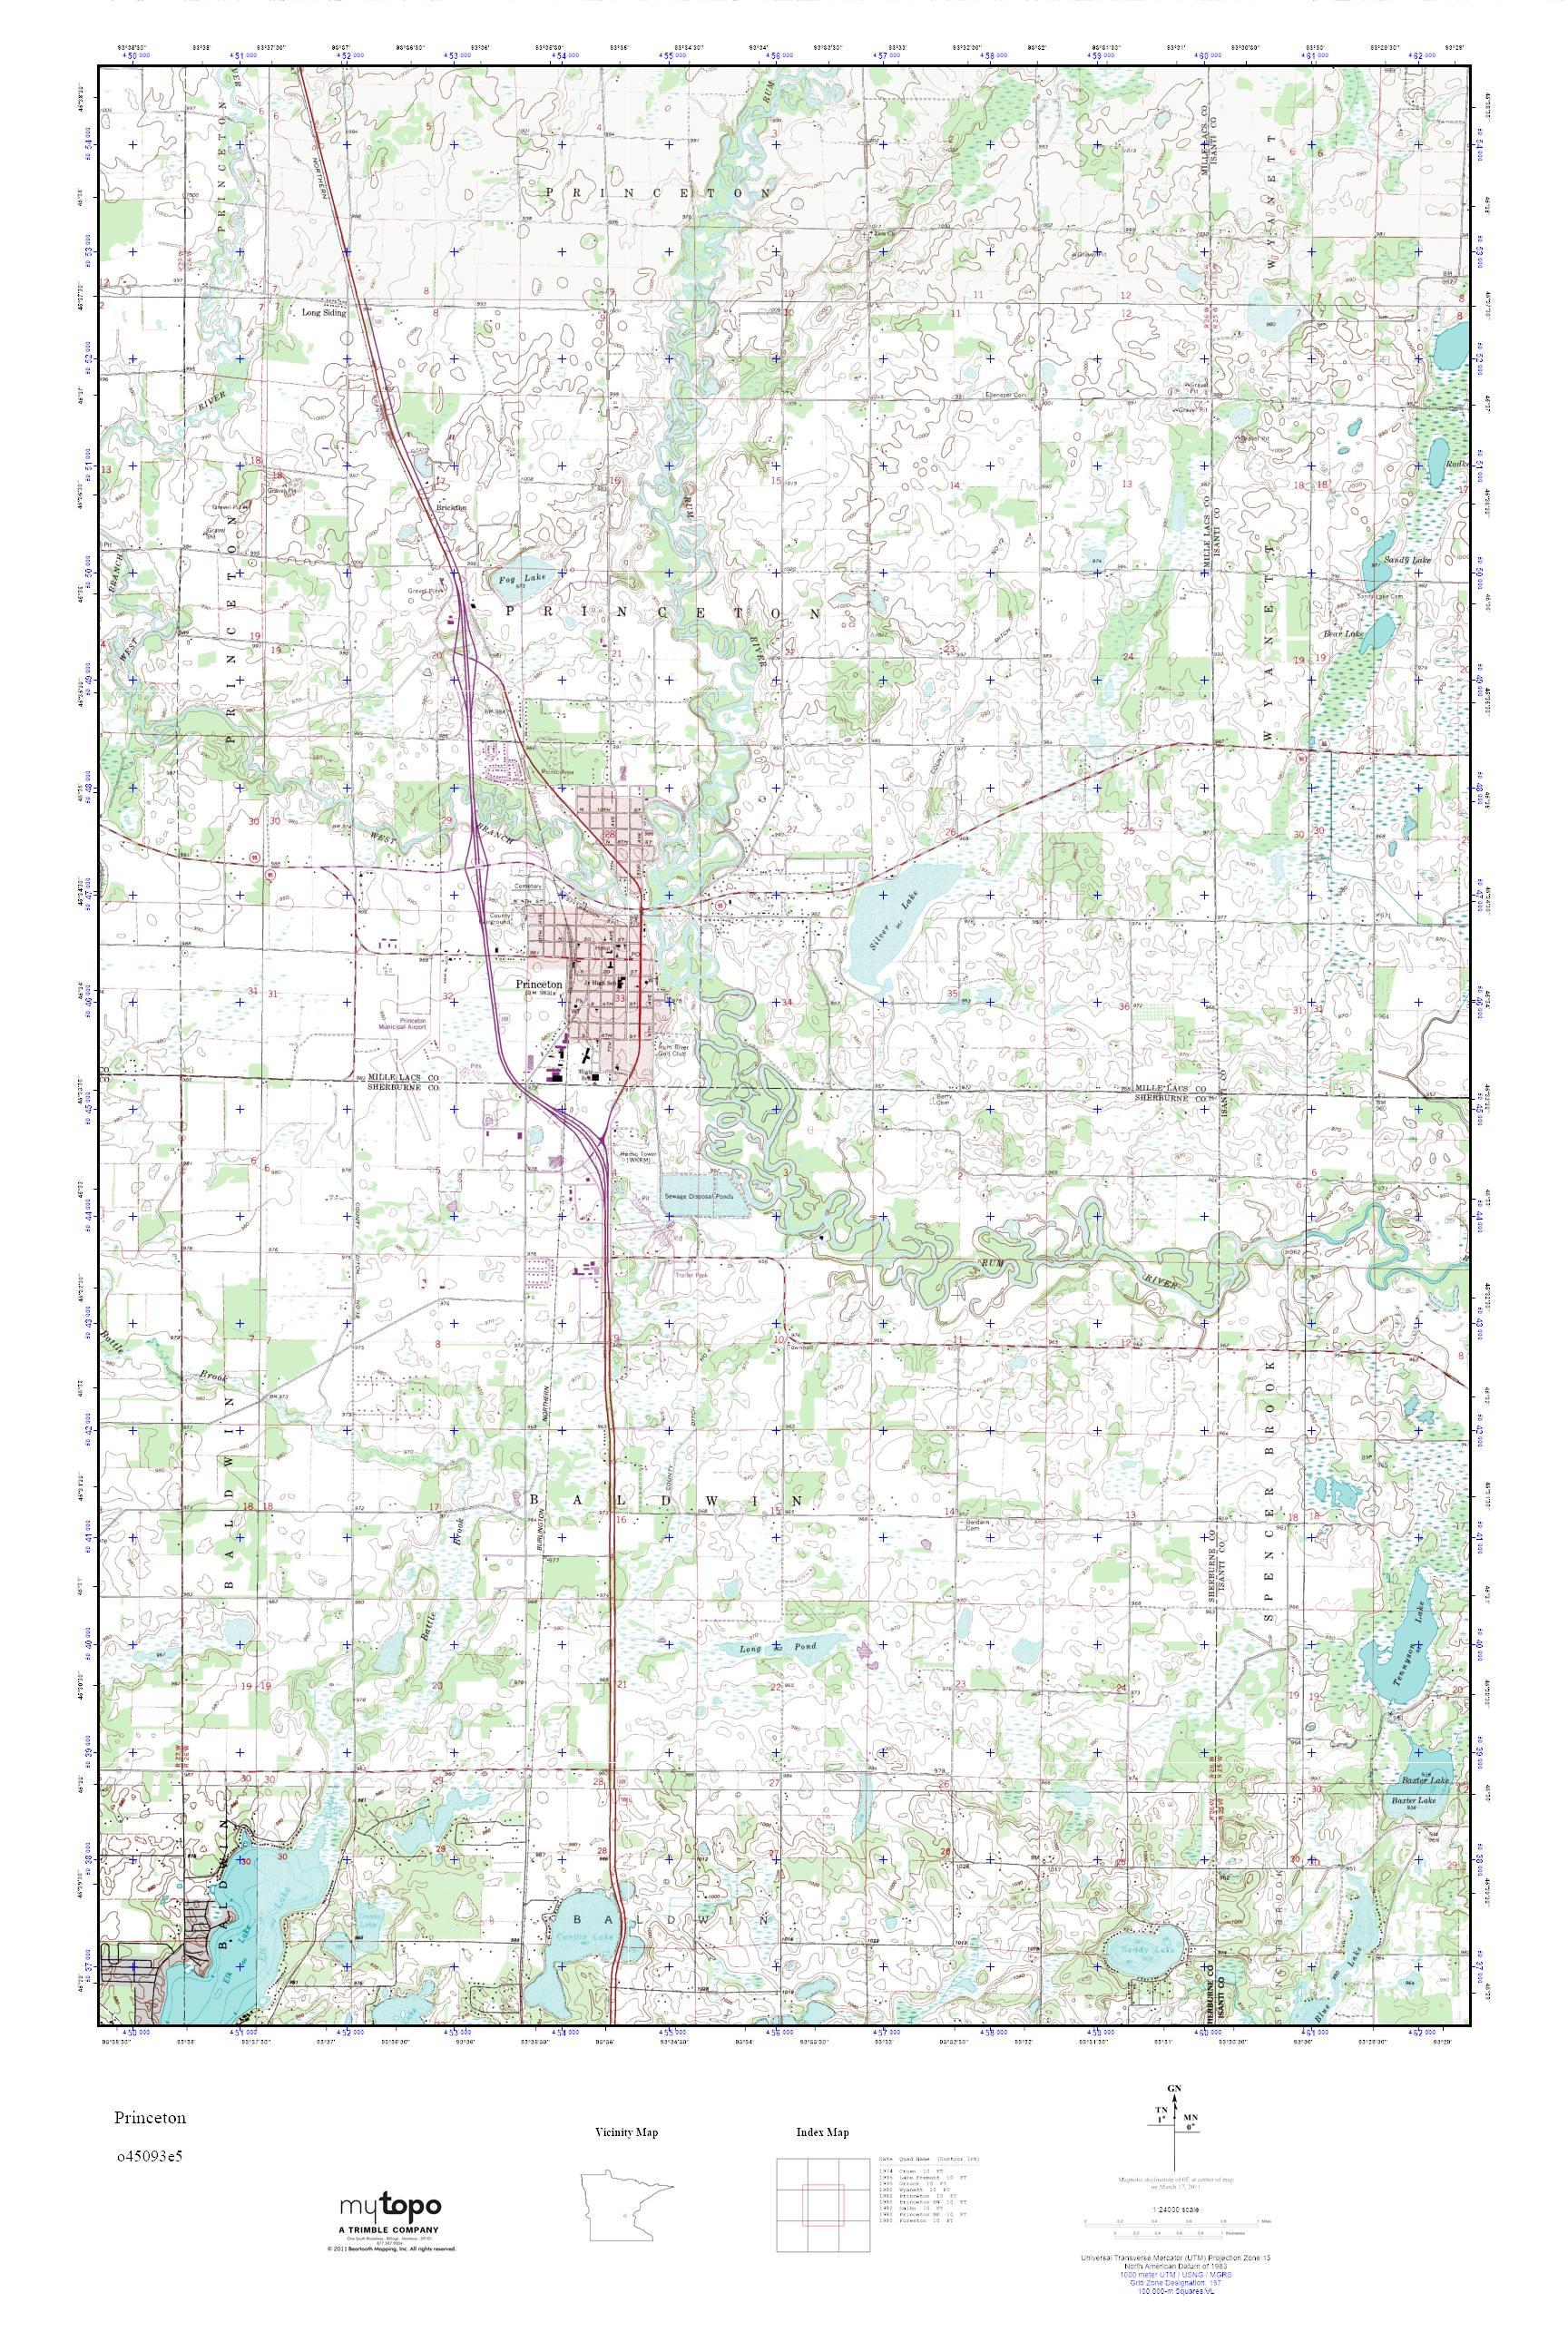 Princeton Minnesota Map.Mytopo Princeton Minnesota Usgs Quad Topo Map